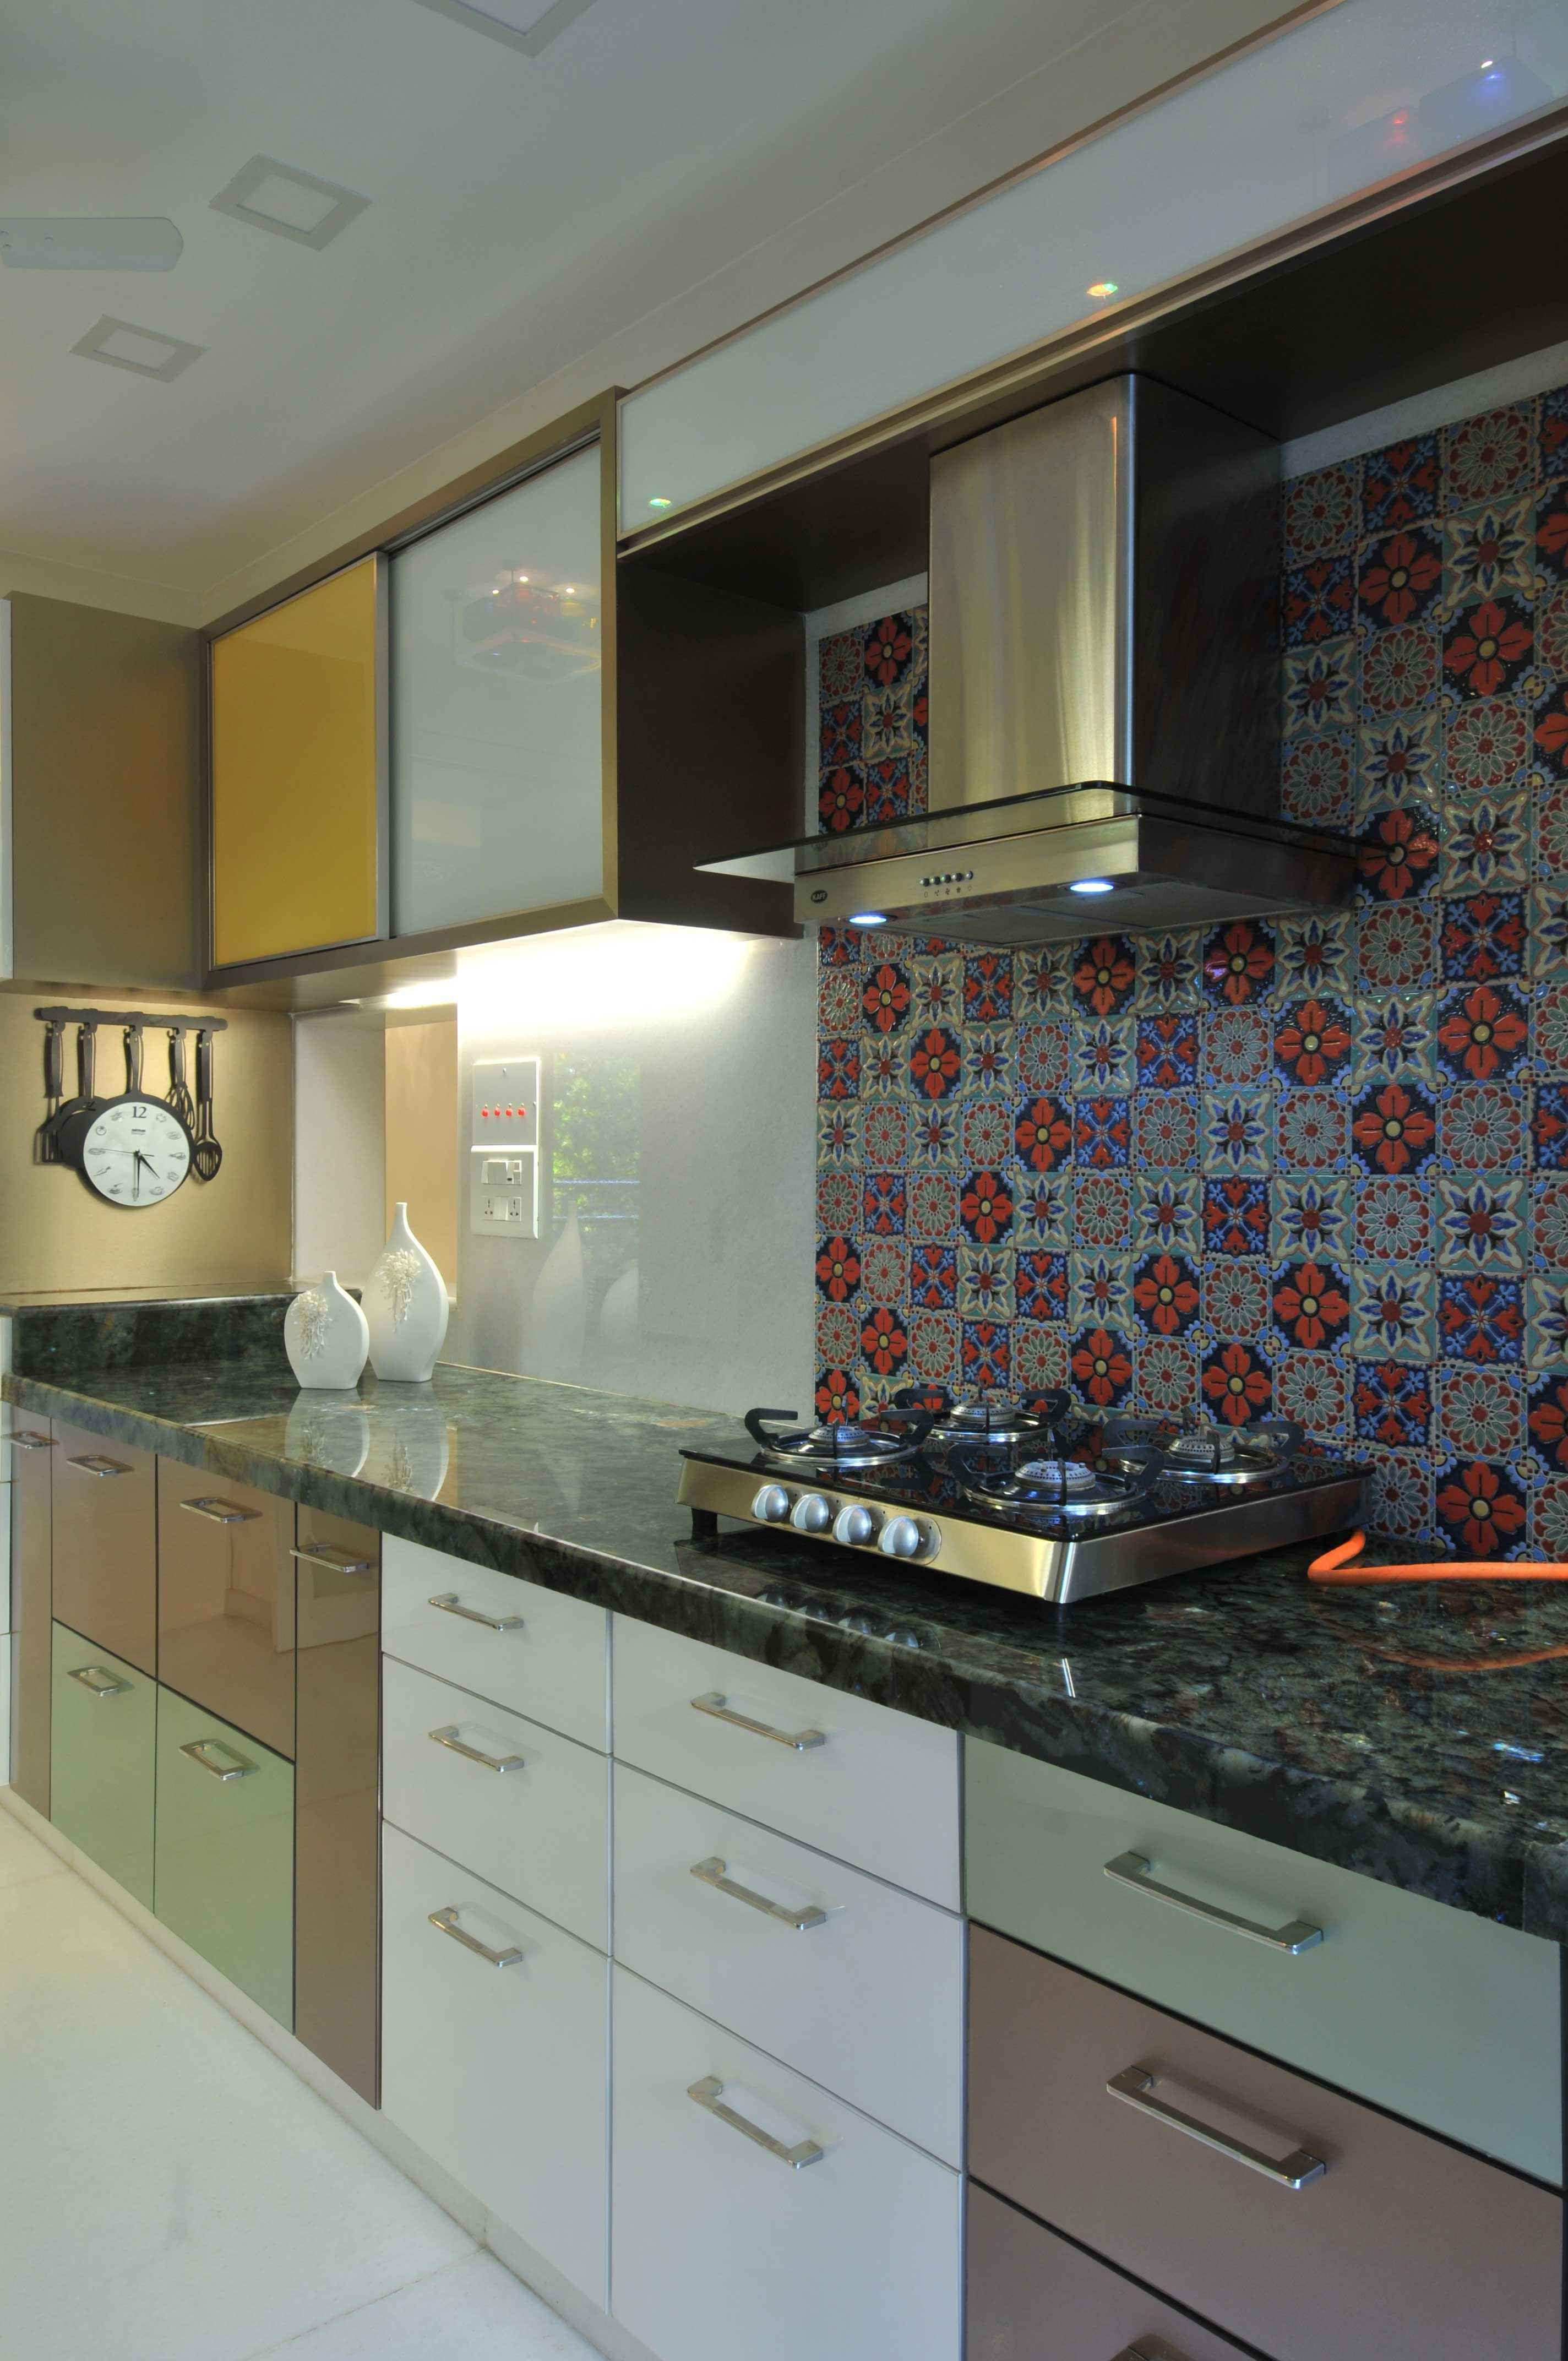 Pin by shraddhaparekh on case study mumbai Kitchen